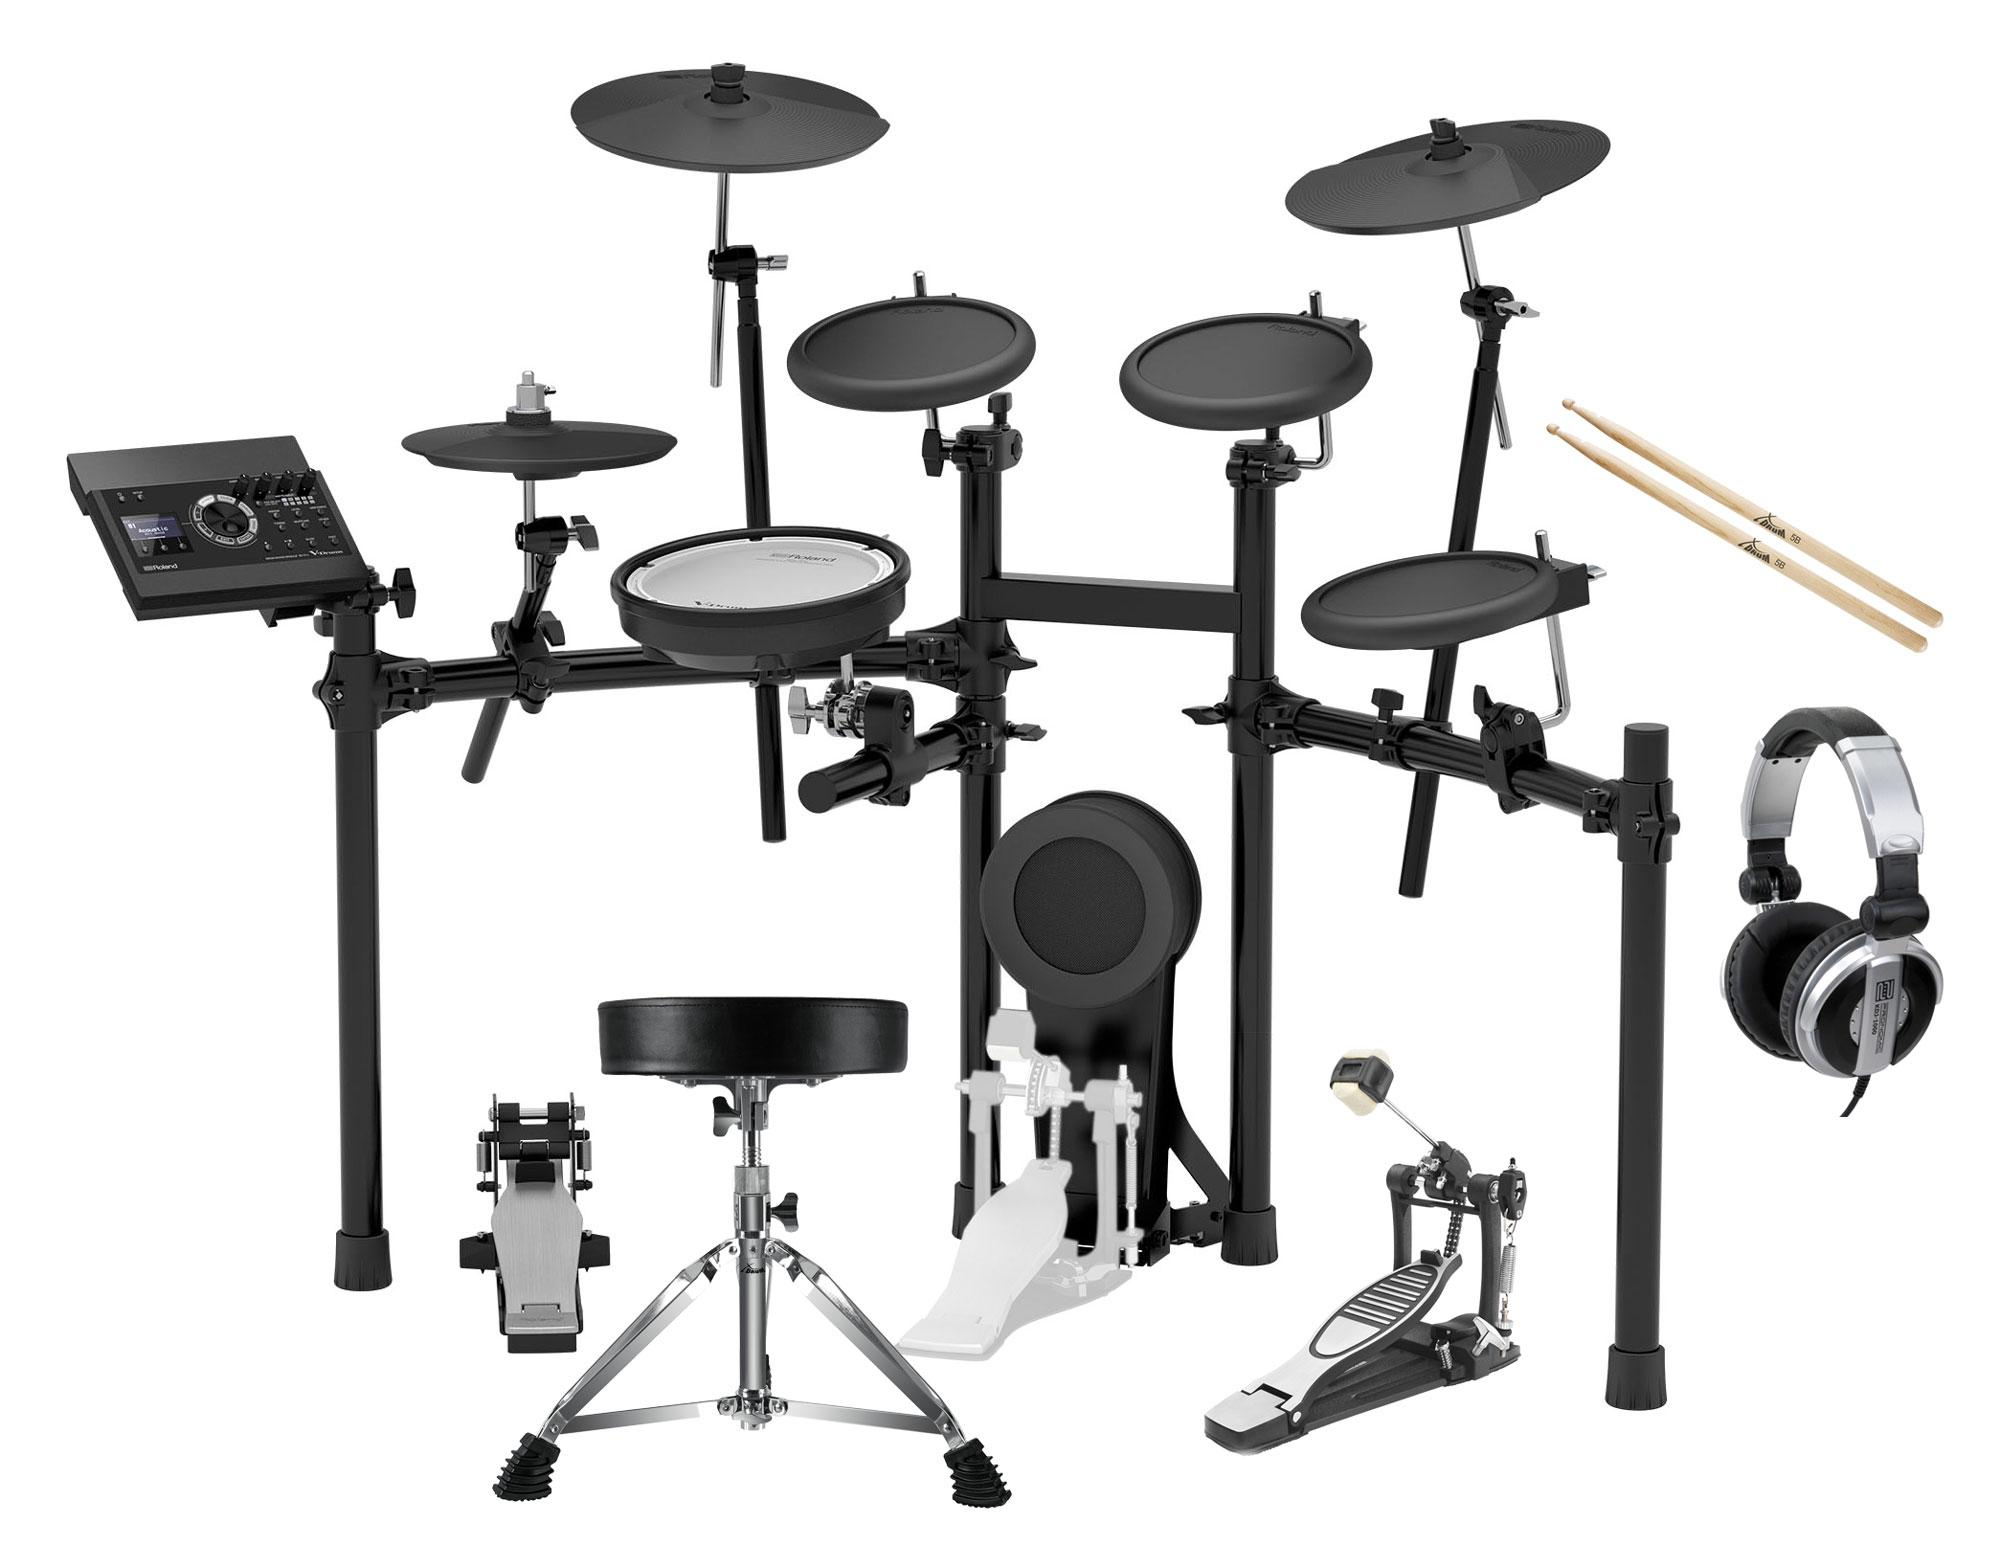 Roland TD 17K L V Drum Kit Set inkl. Hocker, Sticks, Fußmaschine Kopfhörer